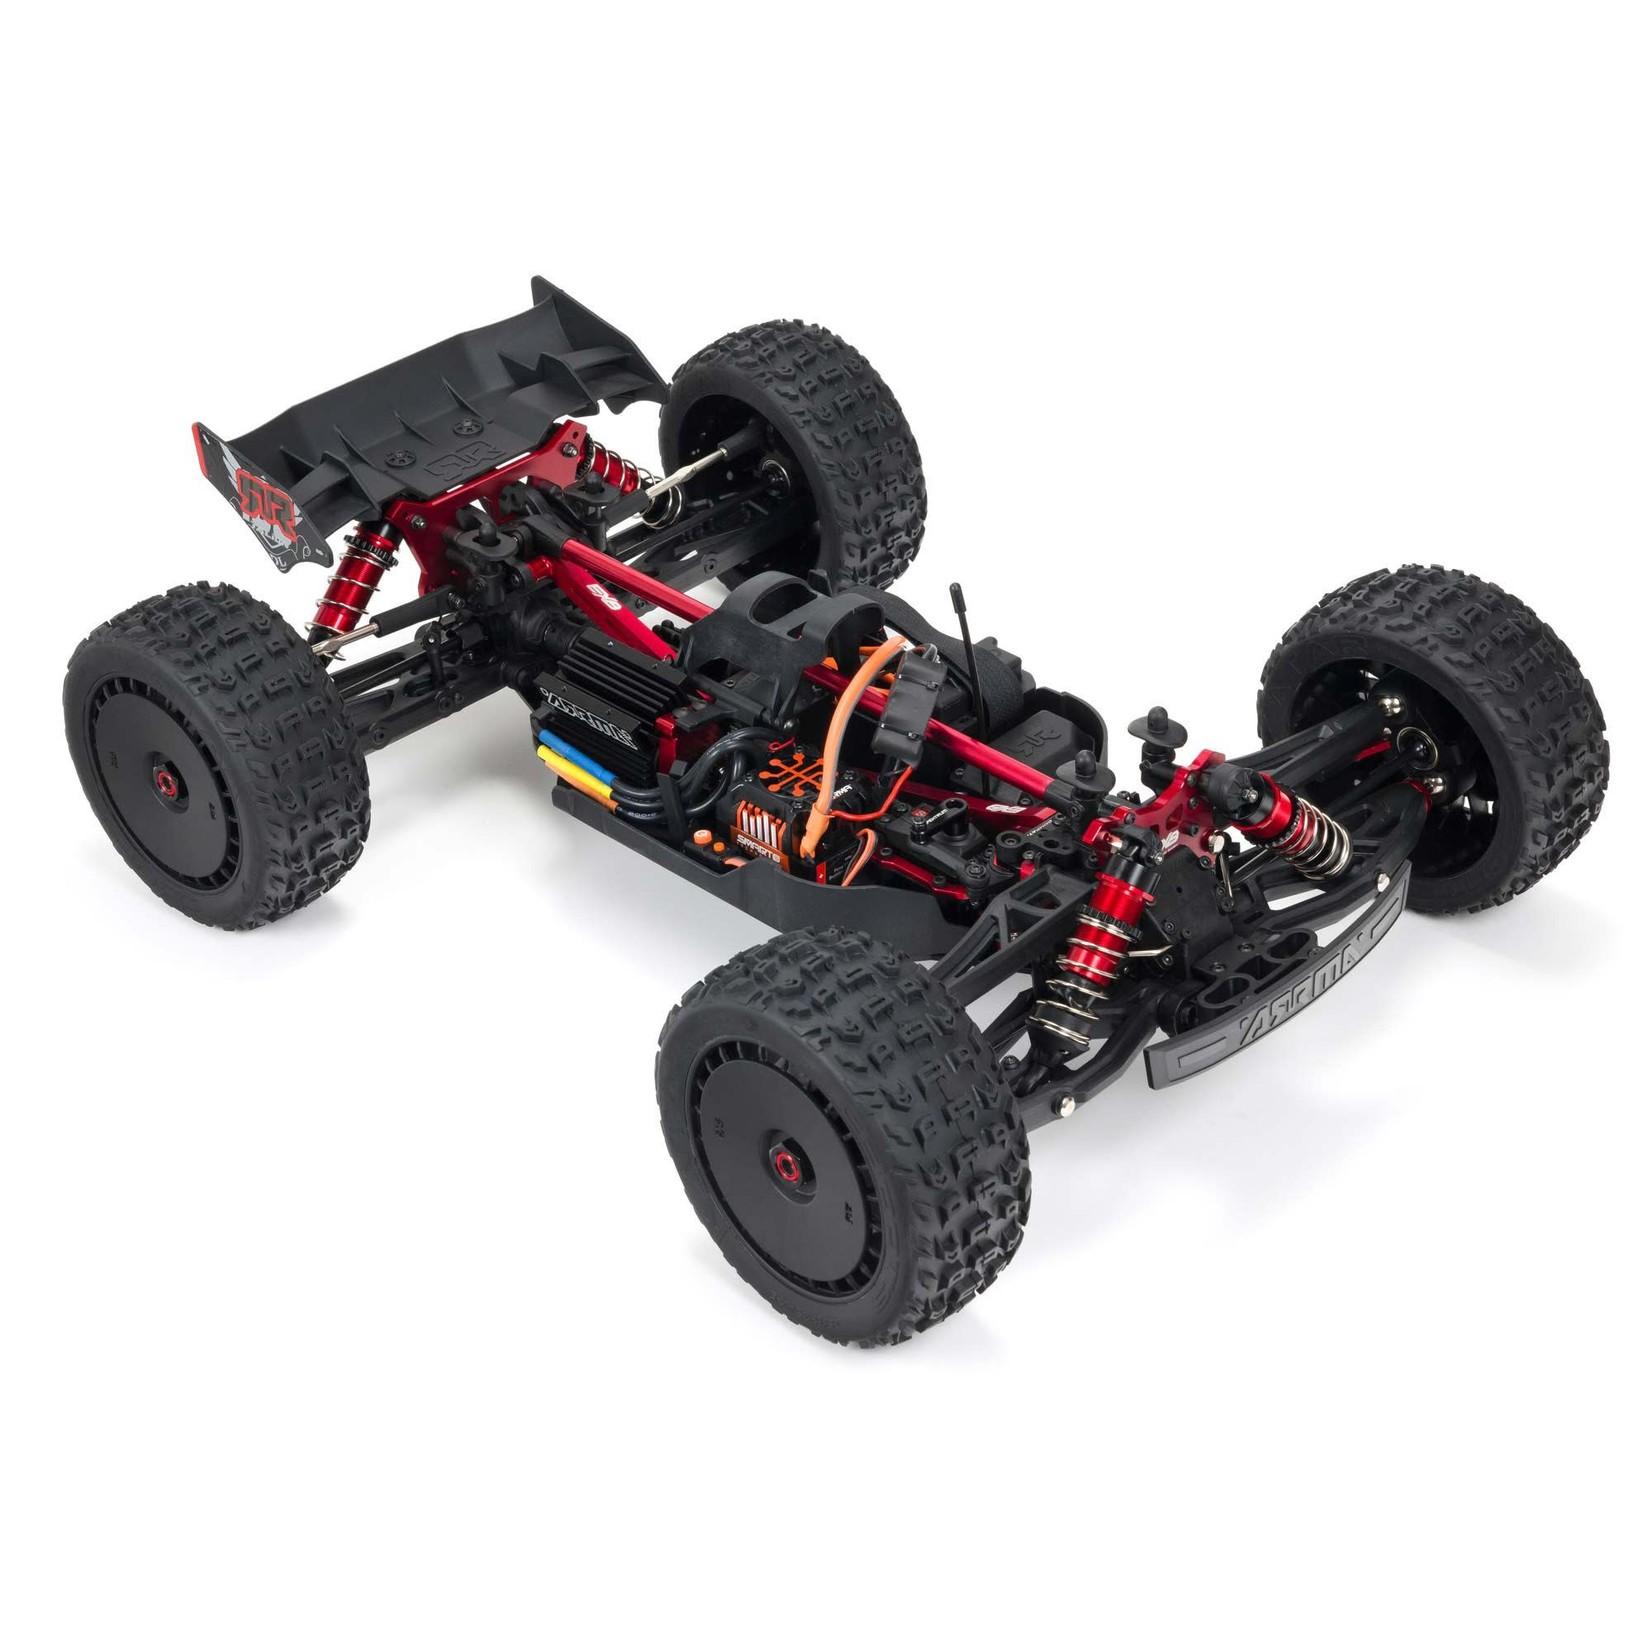 ARRMA ARA8707 ARRMA 1/8 TALION 6S BLX 4WD EXtreme Bash Speed Truggy RTR, Black